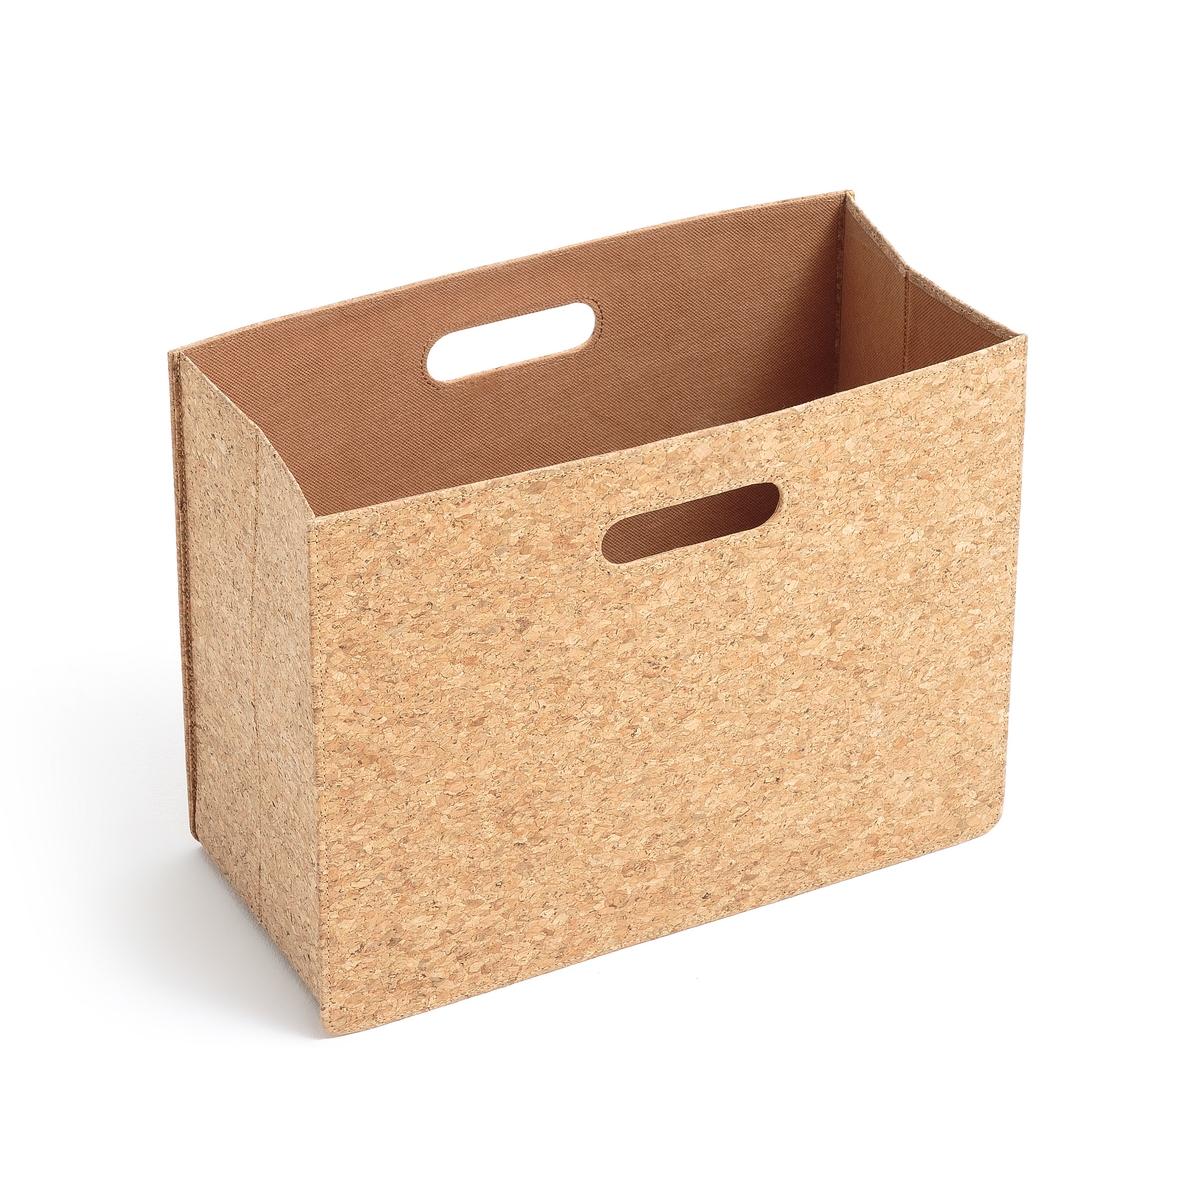 Коробка для журналов из пробки, MASAO коробка для мушек snowbee slit foam compartment waterproof fly box x large